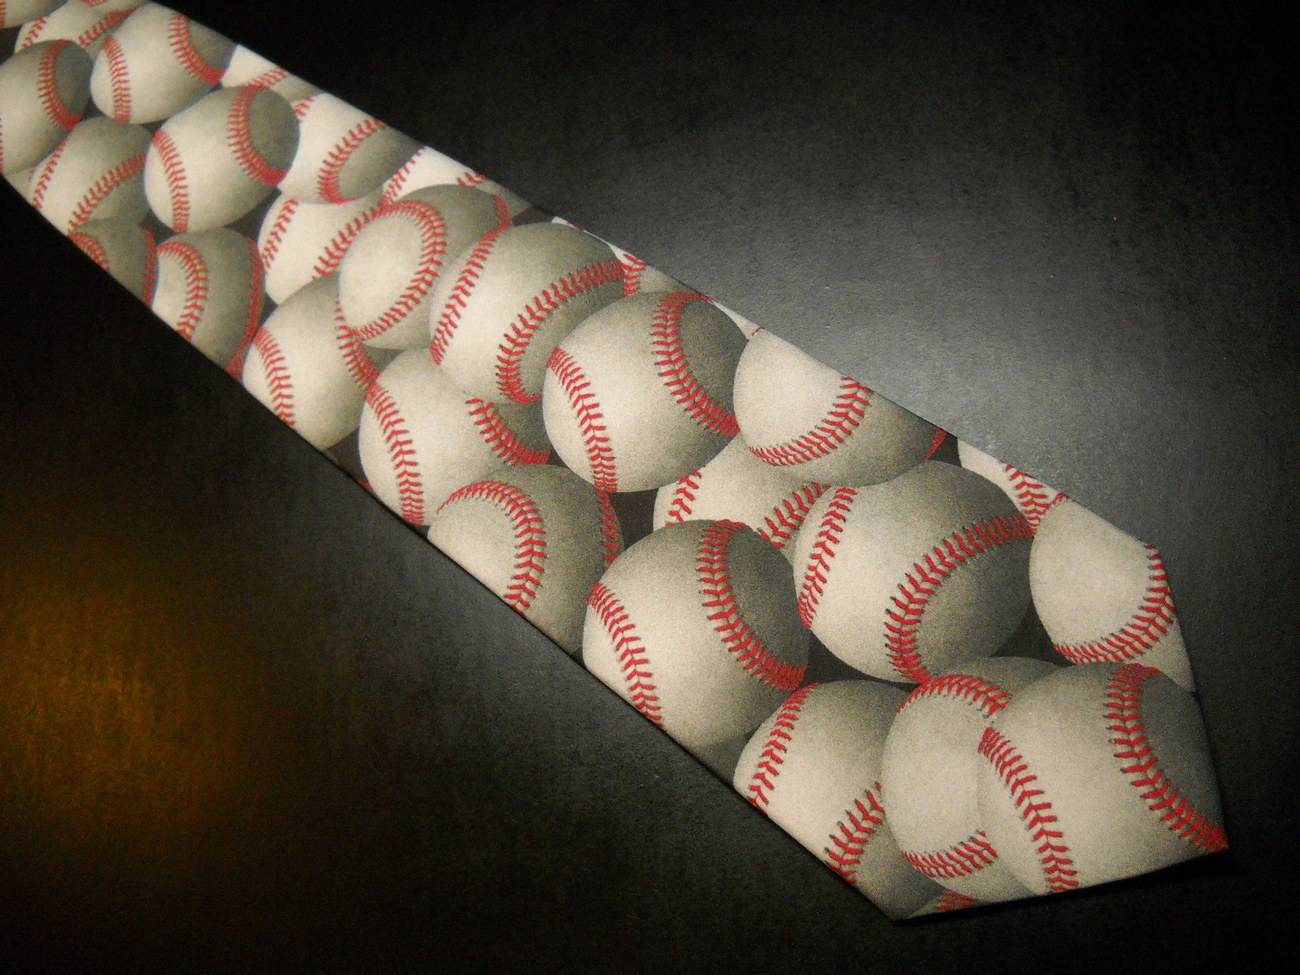 Ralph Marlin Neck Tie Just Balls Baseballs 1995 Monotone Baseballs Red Stitching